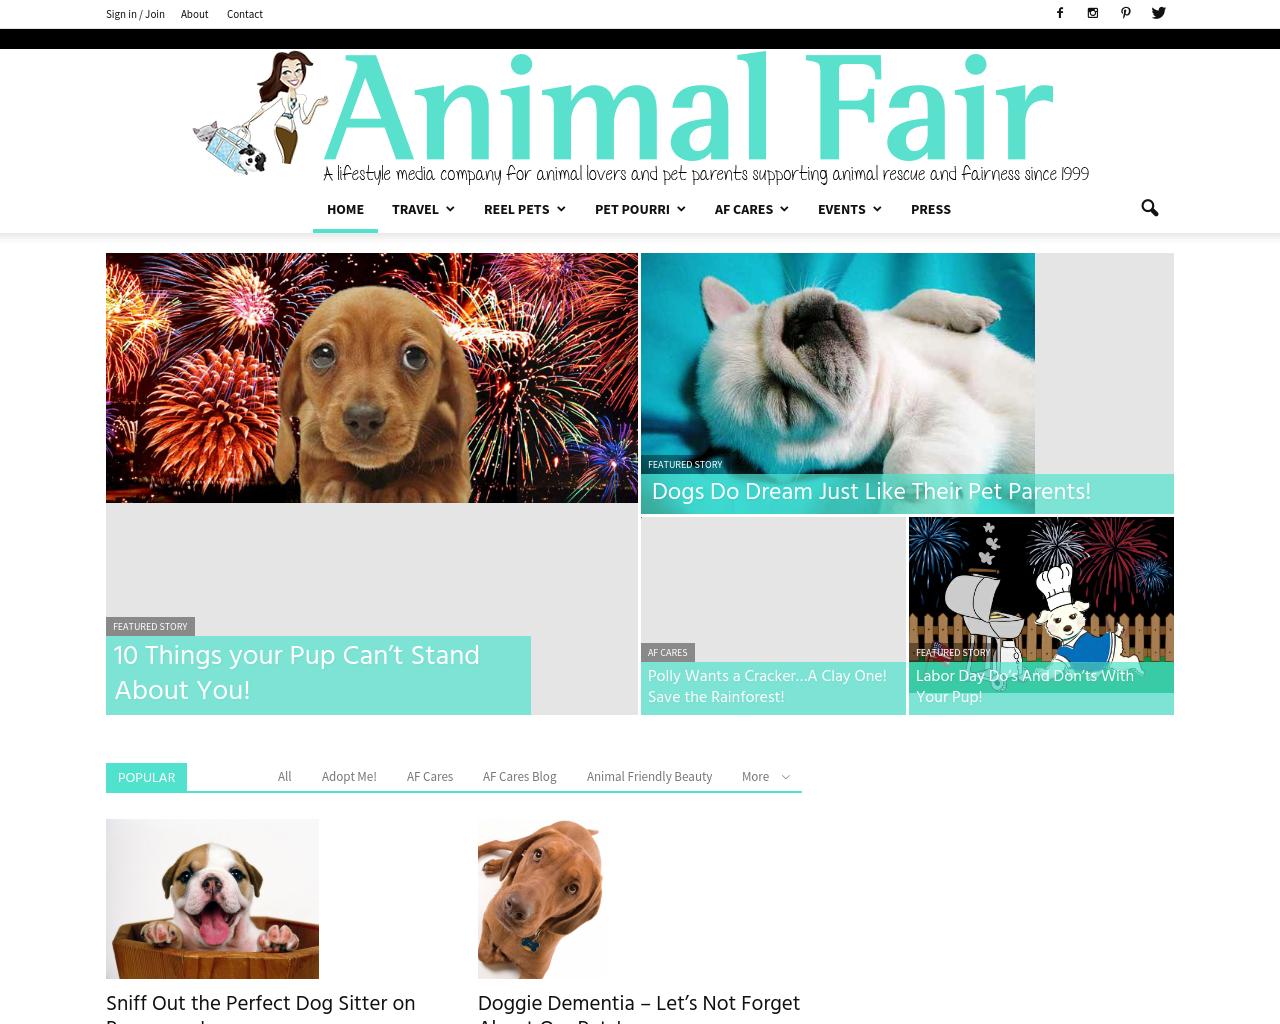 Animal-Fair-Advertising-Reviews-Pricing